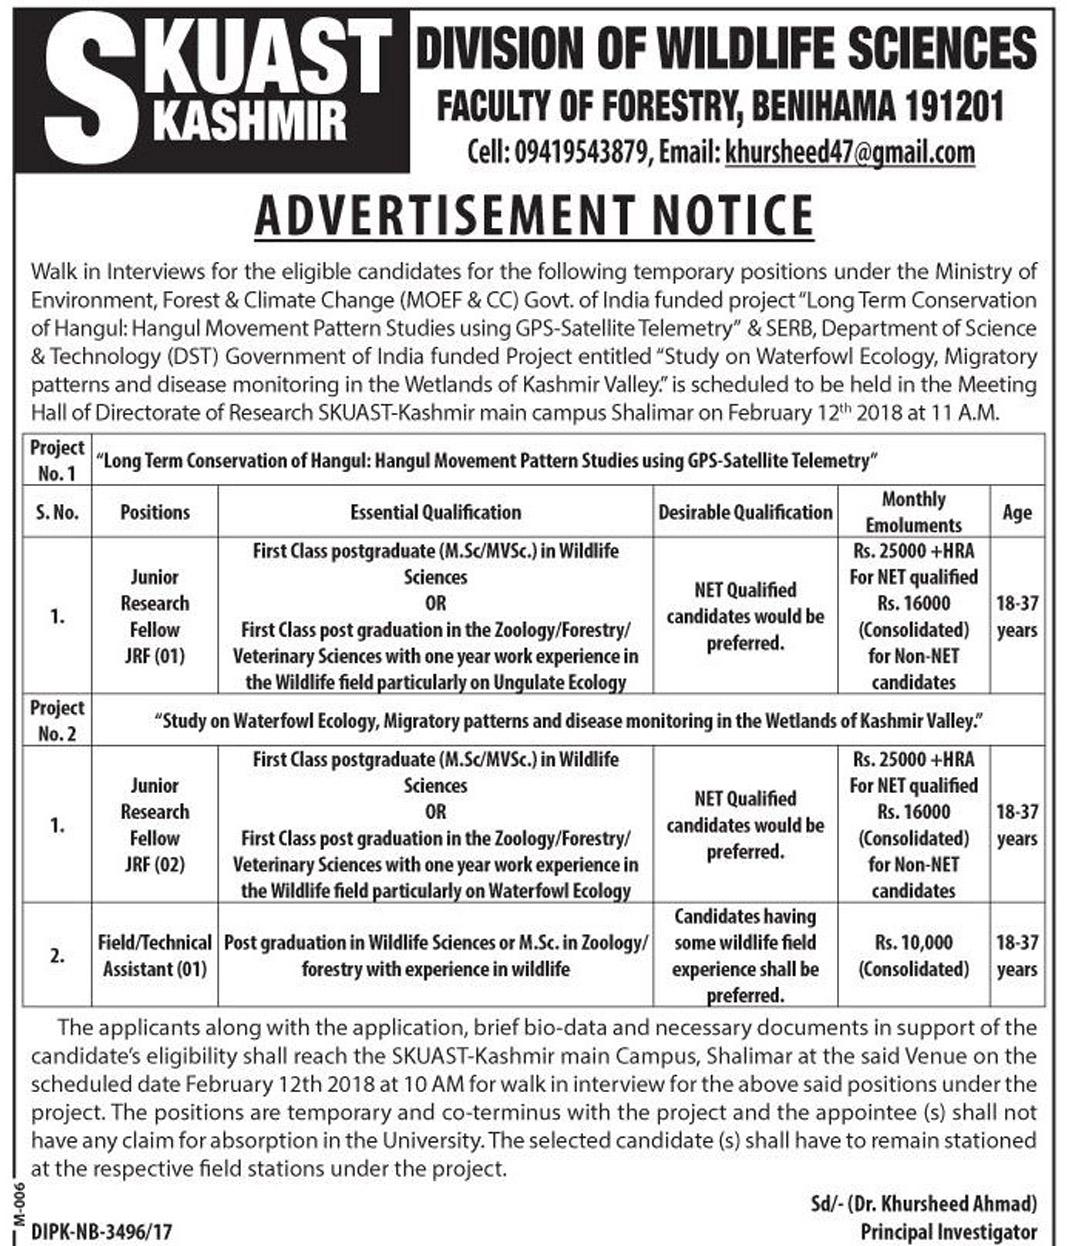 Job opportunities at SKUAST Kashmir